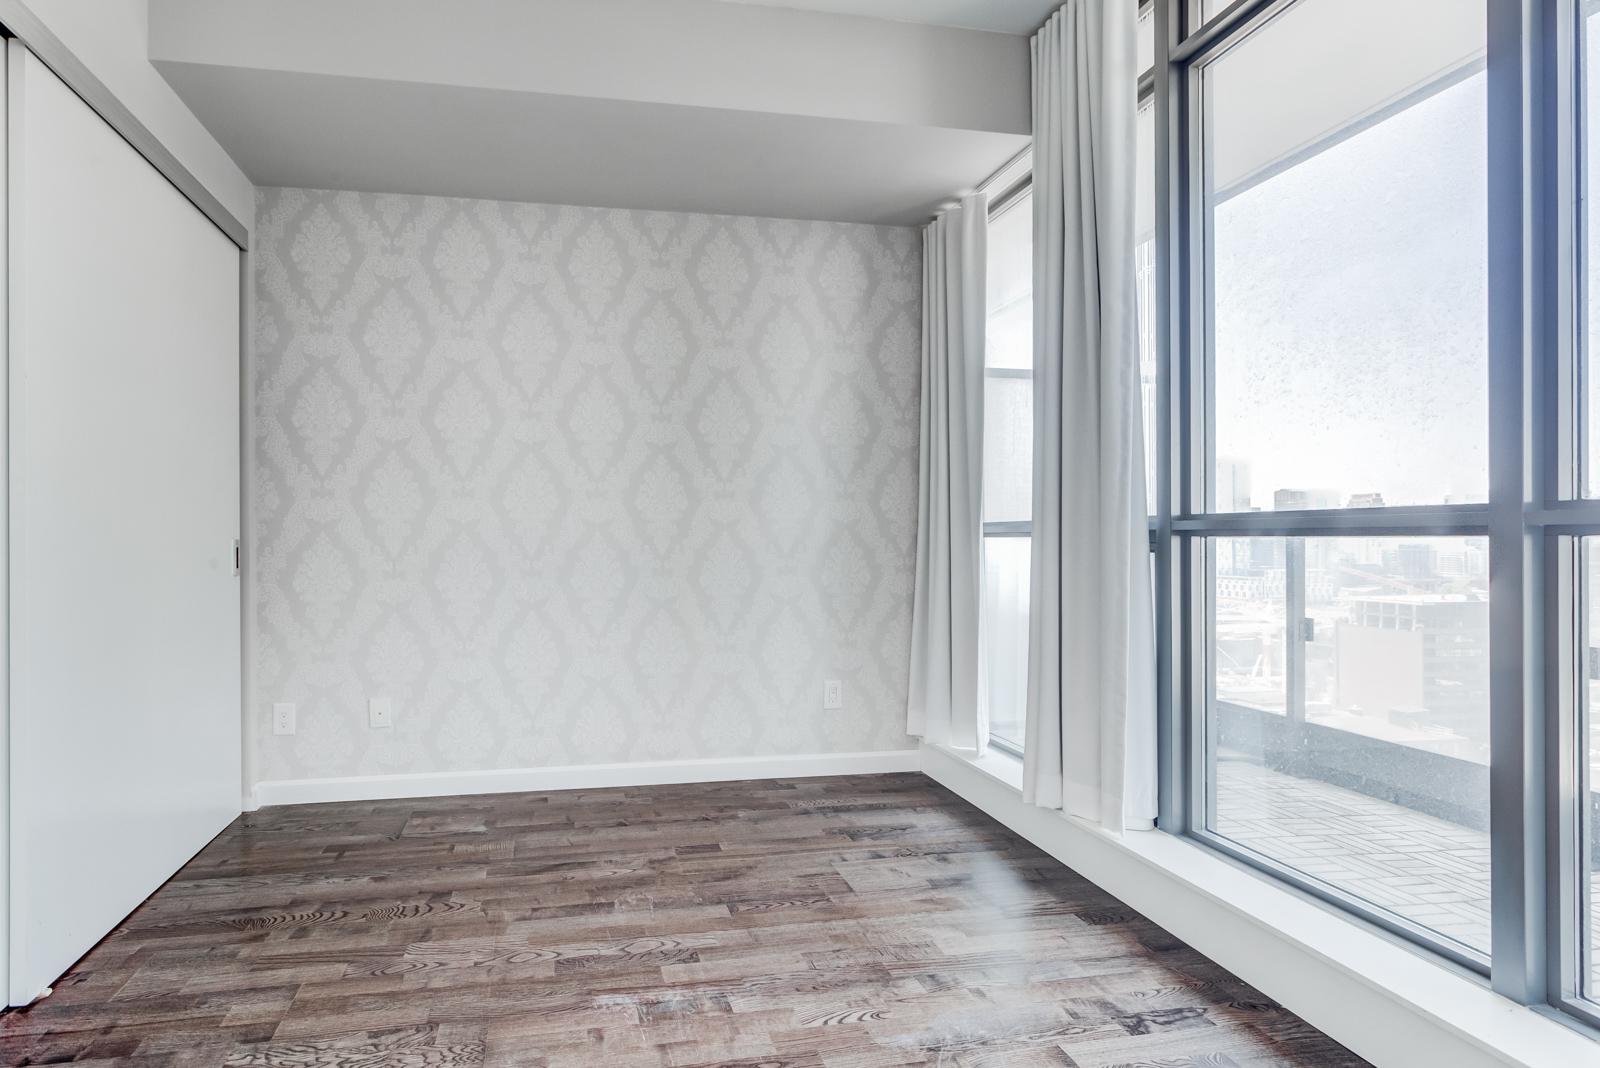 Empty master bedroom with huge windows, dark laminate floors and gray walls.